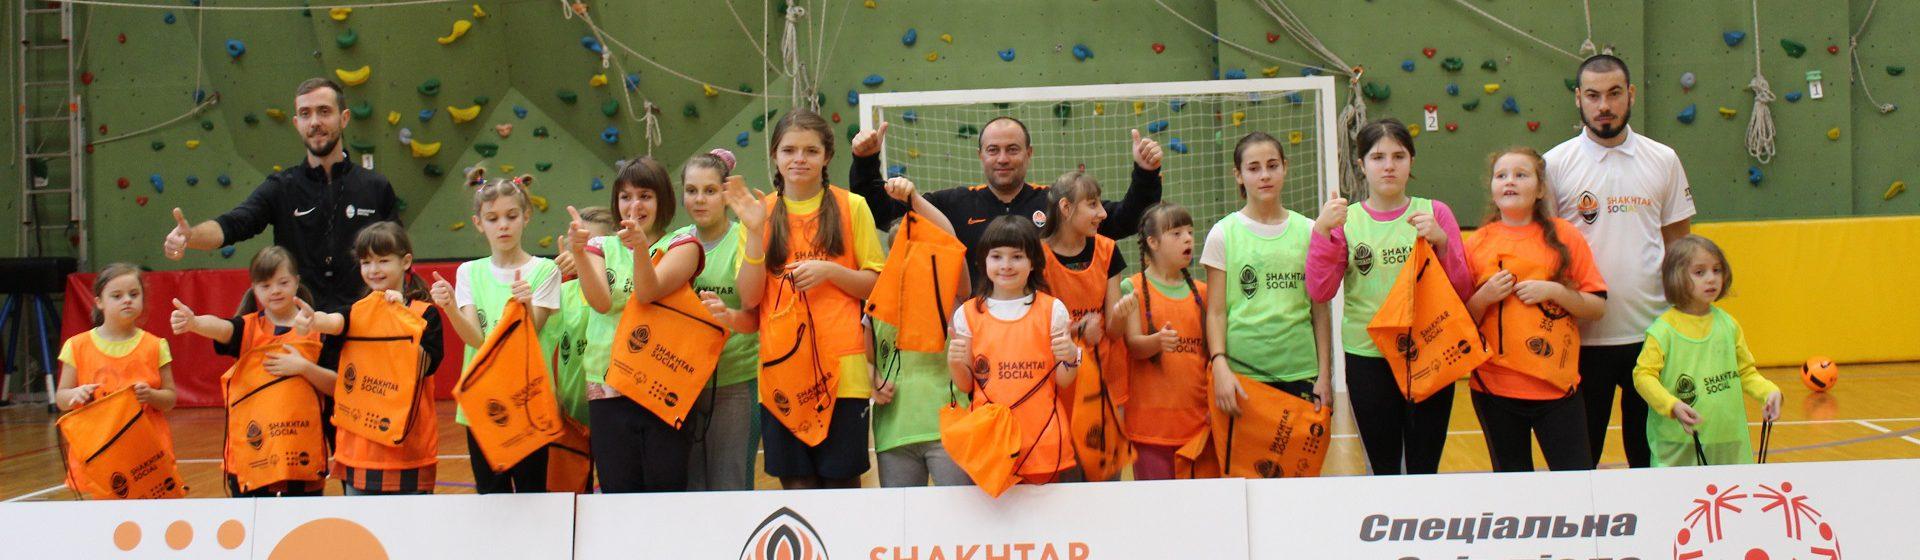 Special Olympics Europe-Eurasia header